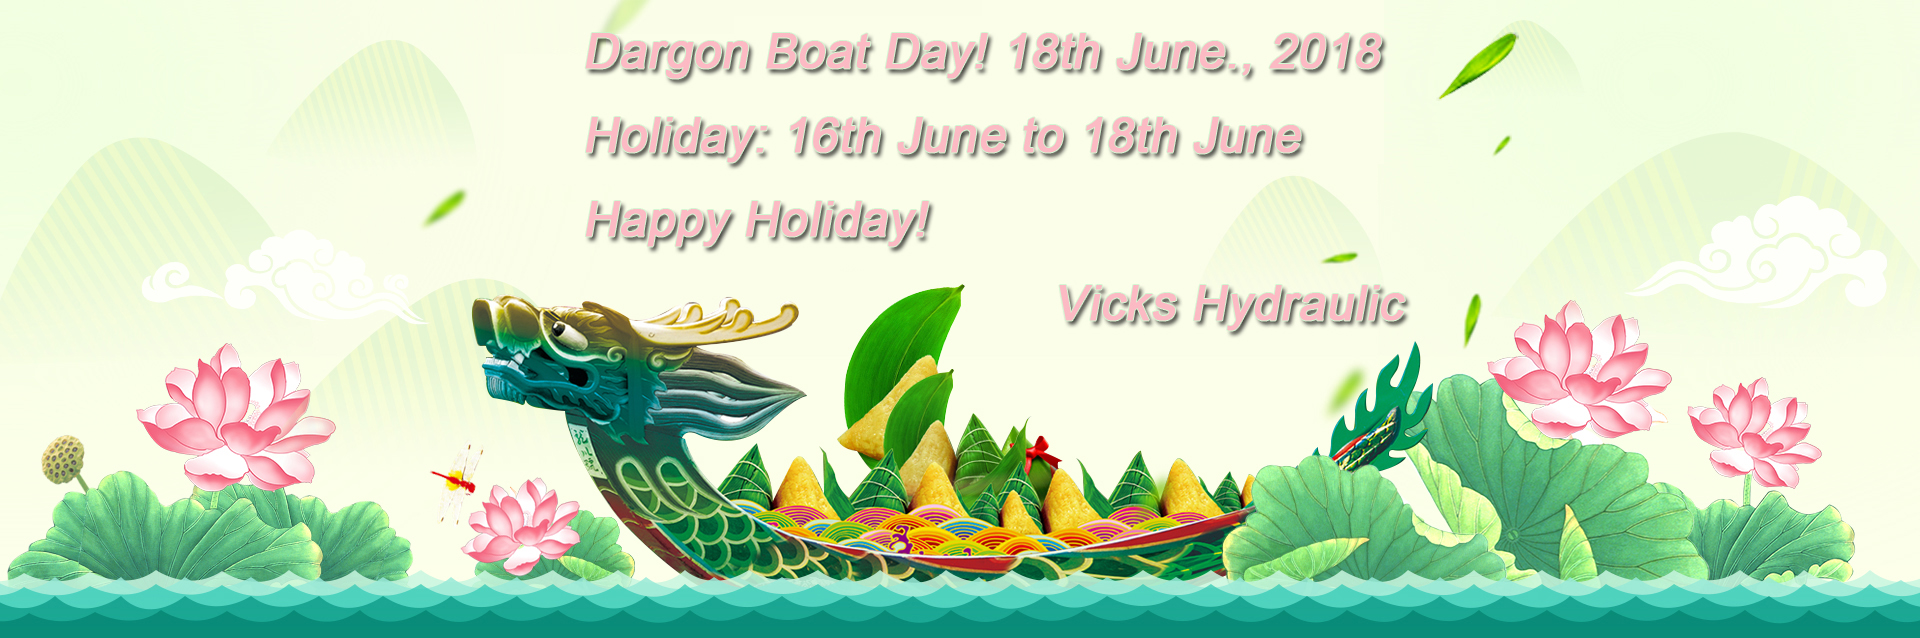 2018 Dargon Boat Day